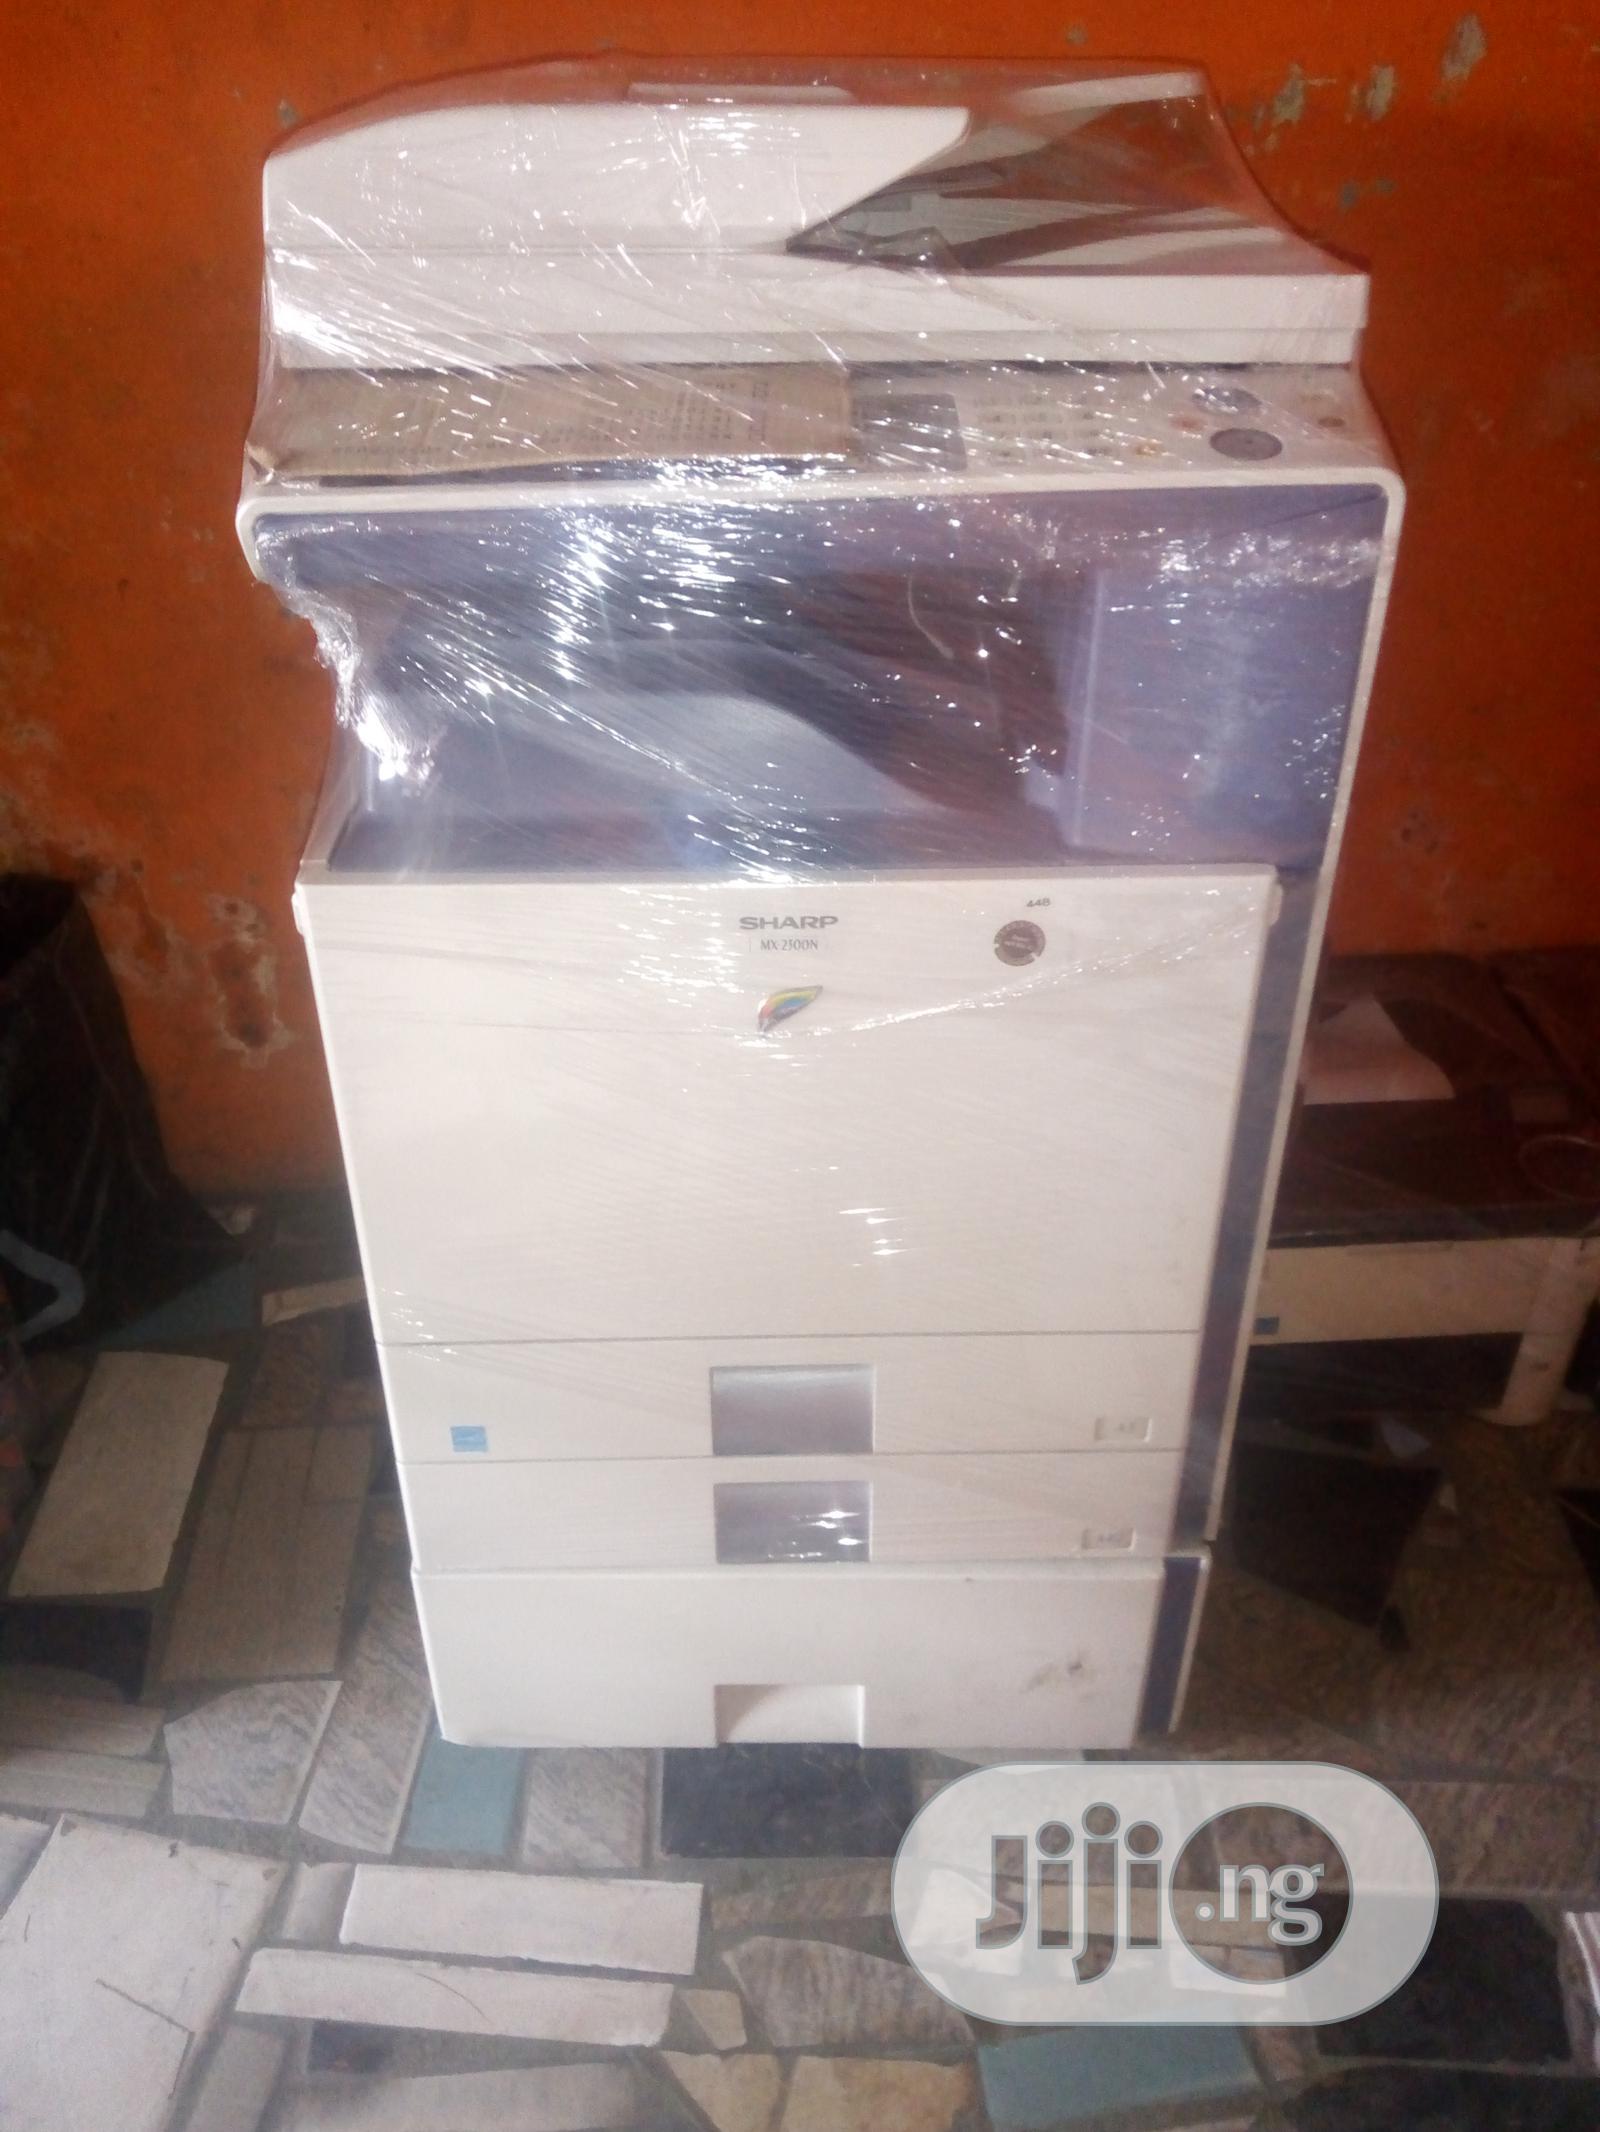 Sharp Mx-2300n Multifunctional   Printers & Scanners for sale in Surulere, Lagos State, Nigeria